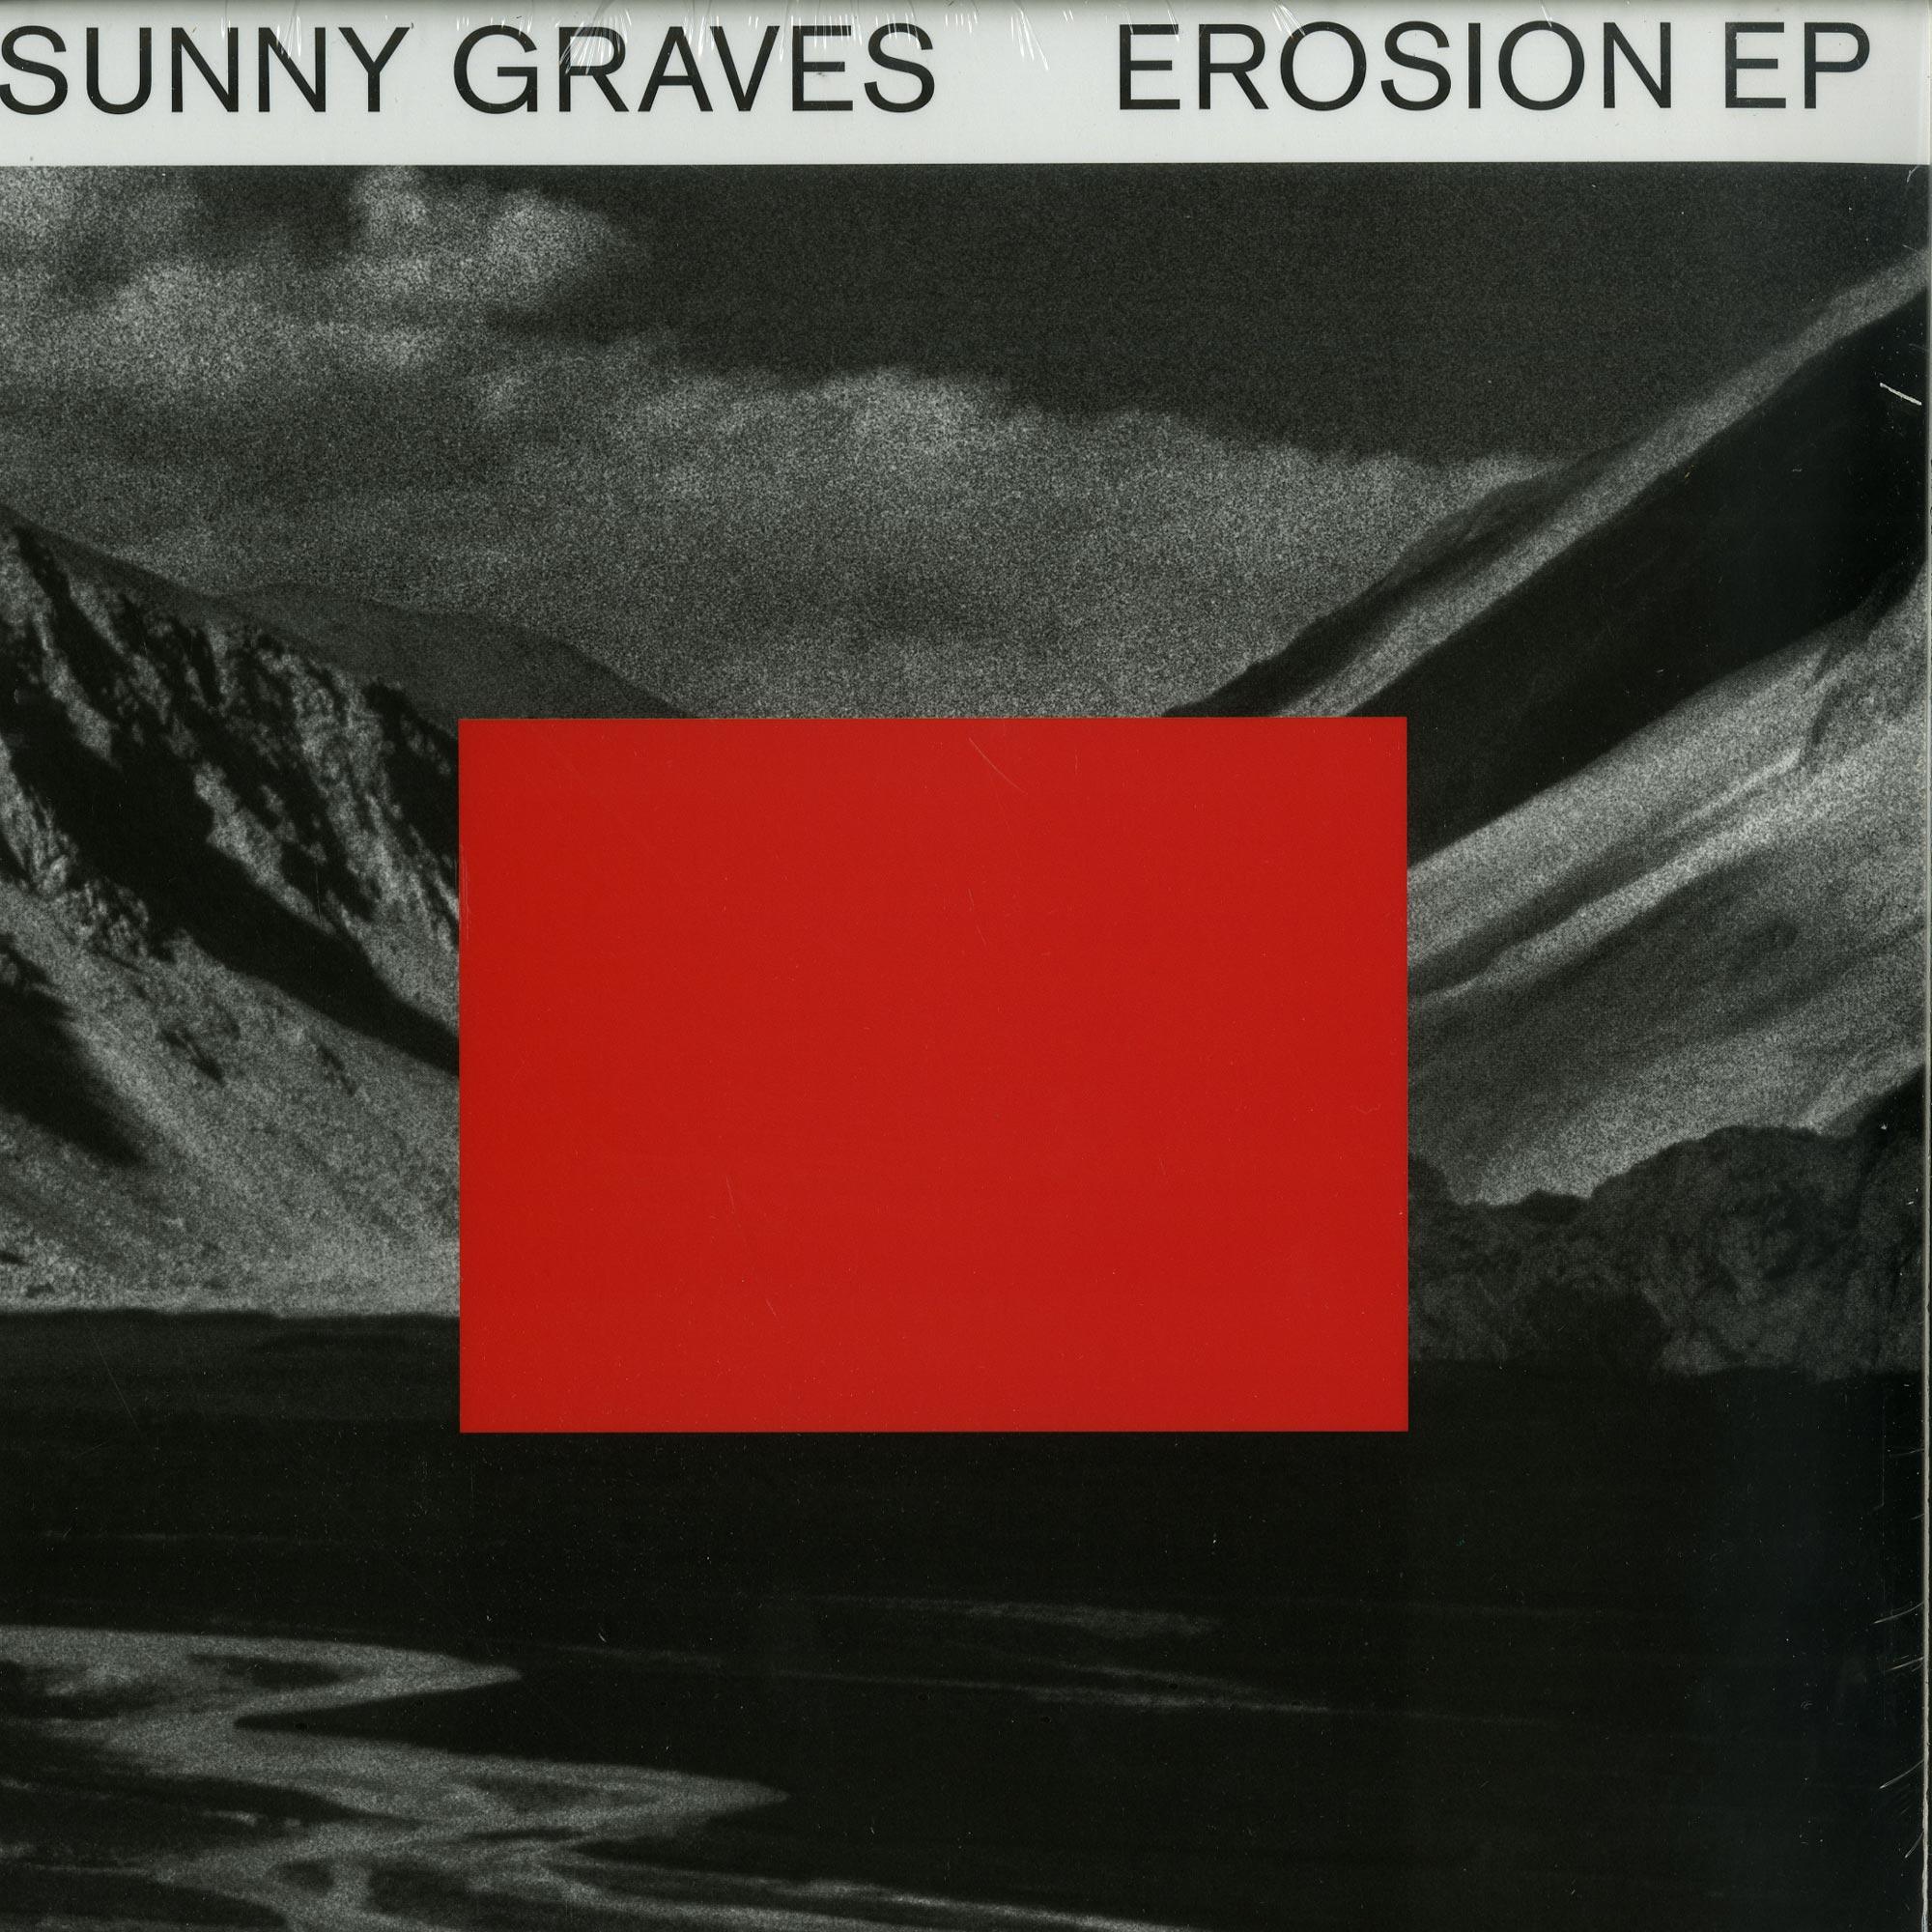 Sunny Graves - EROSION EP